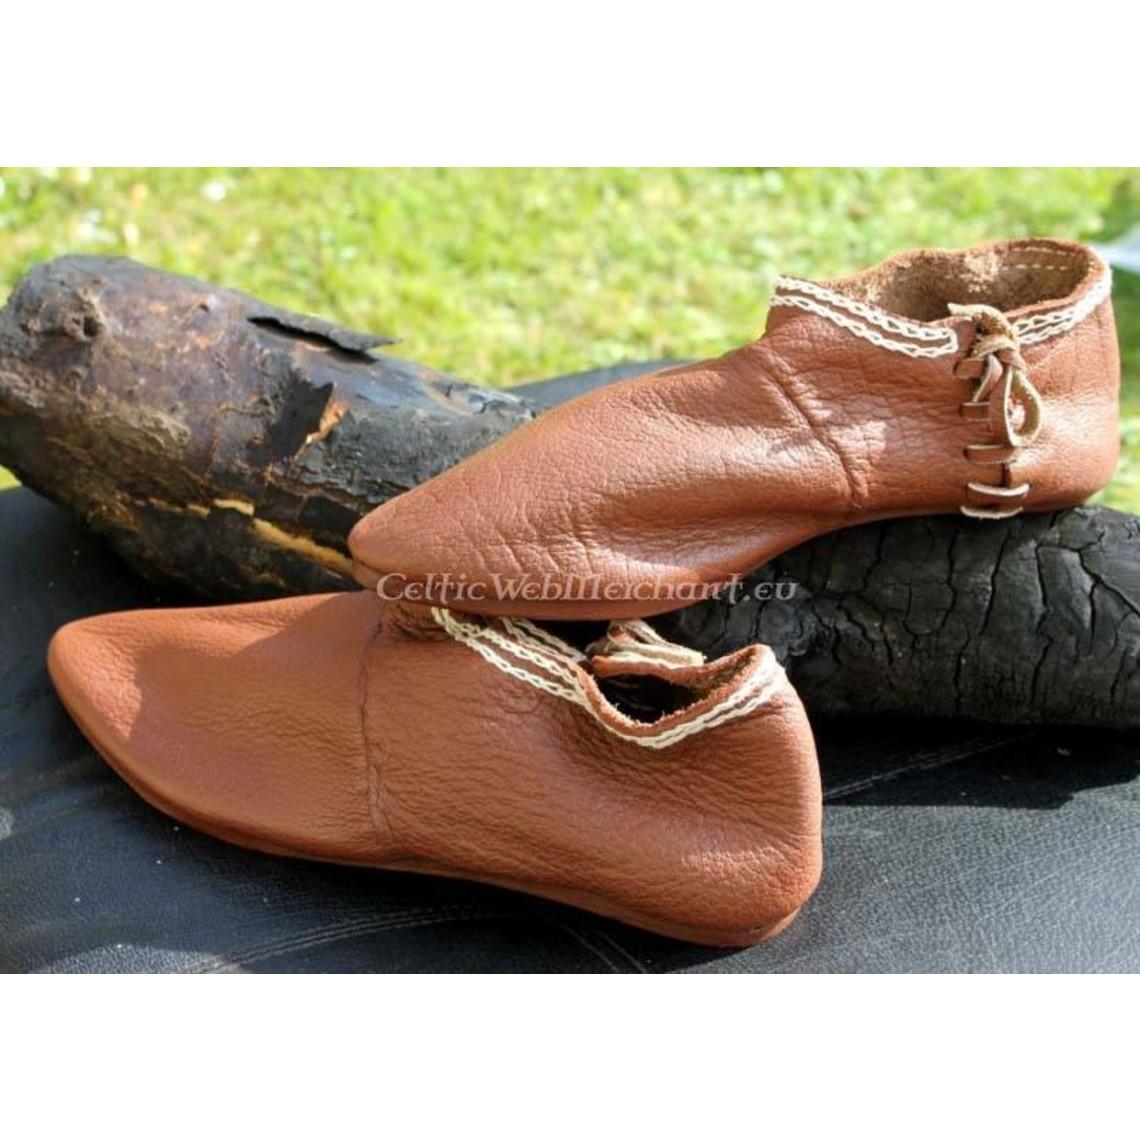 Marshal Historical Zapatos Normandos (1150-1350)